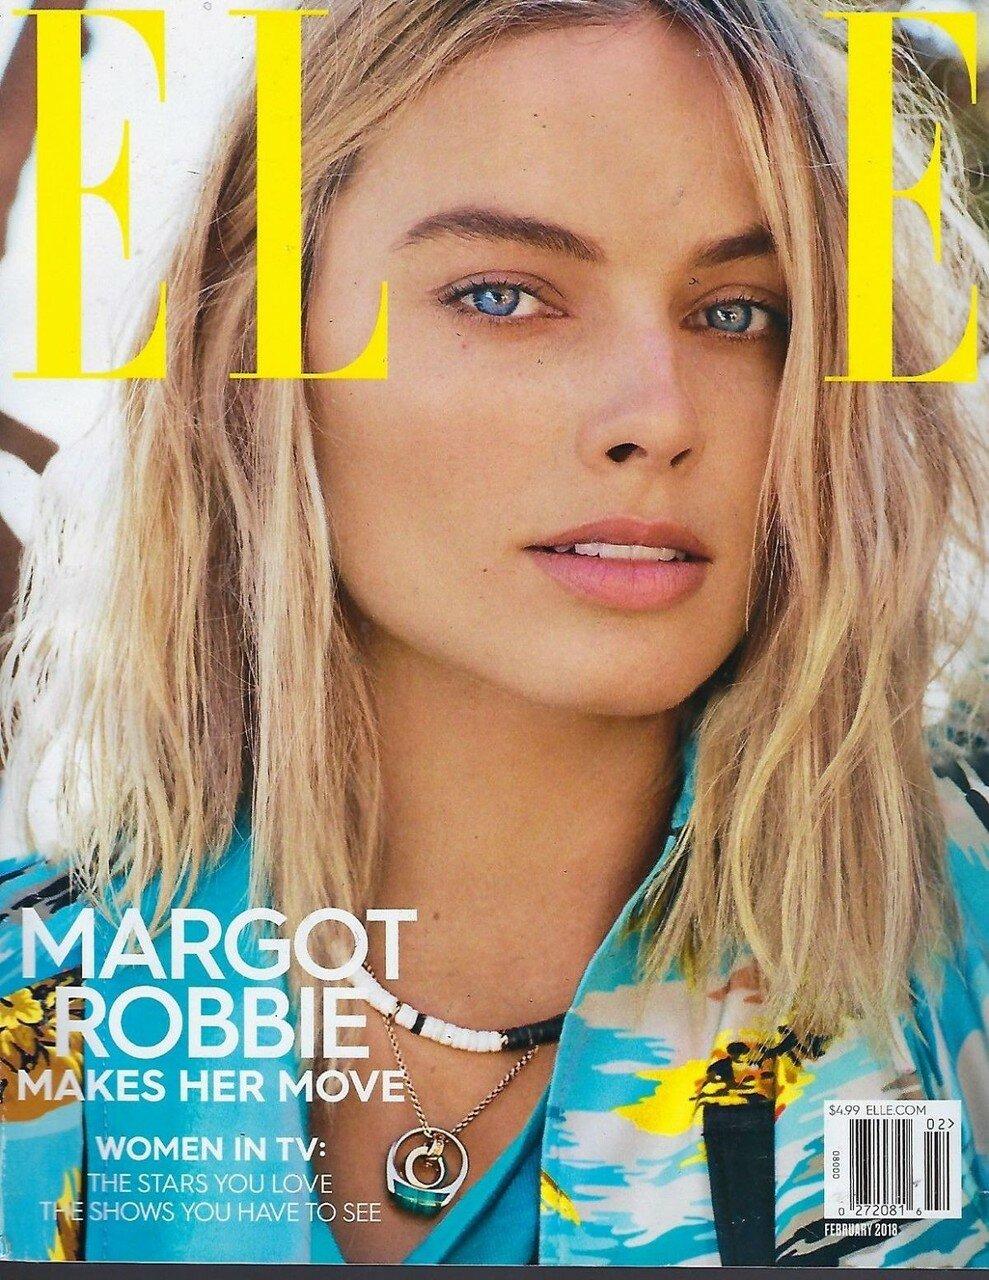 margot-robbie-in-elle-magazine-february-2018-issue-5.jpg